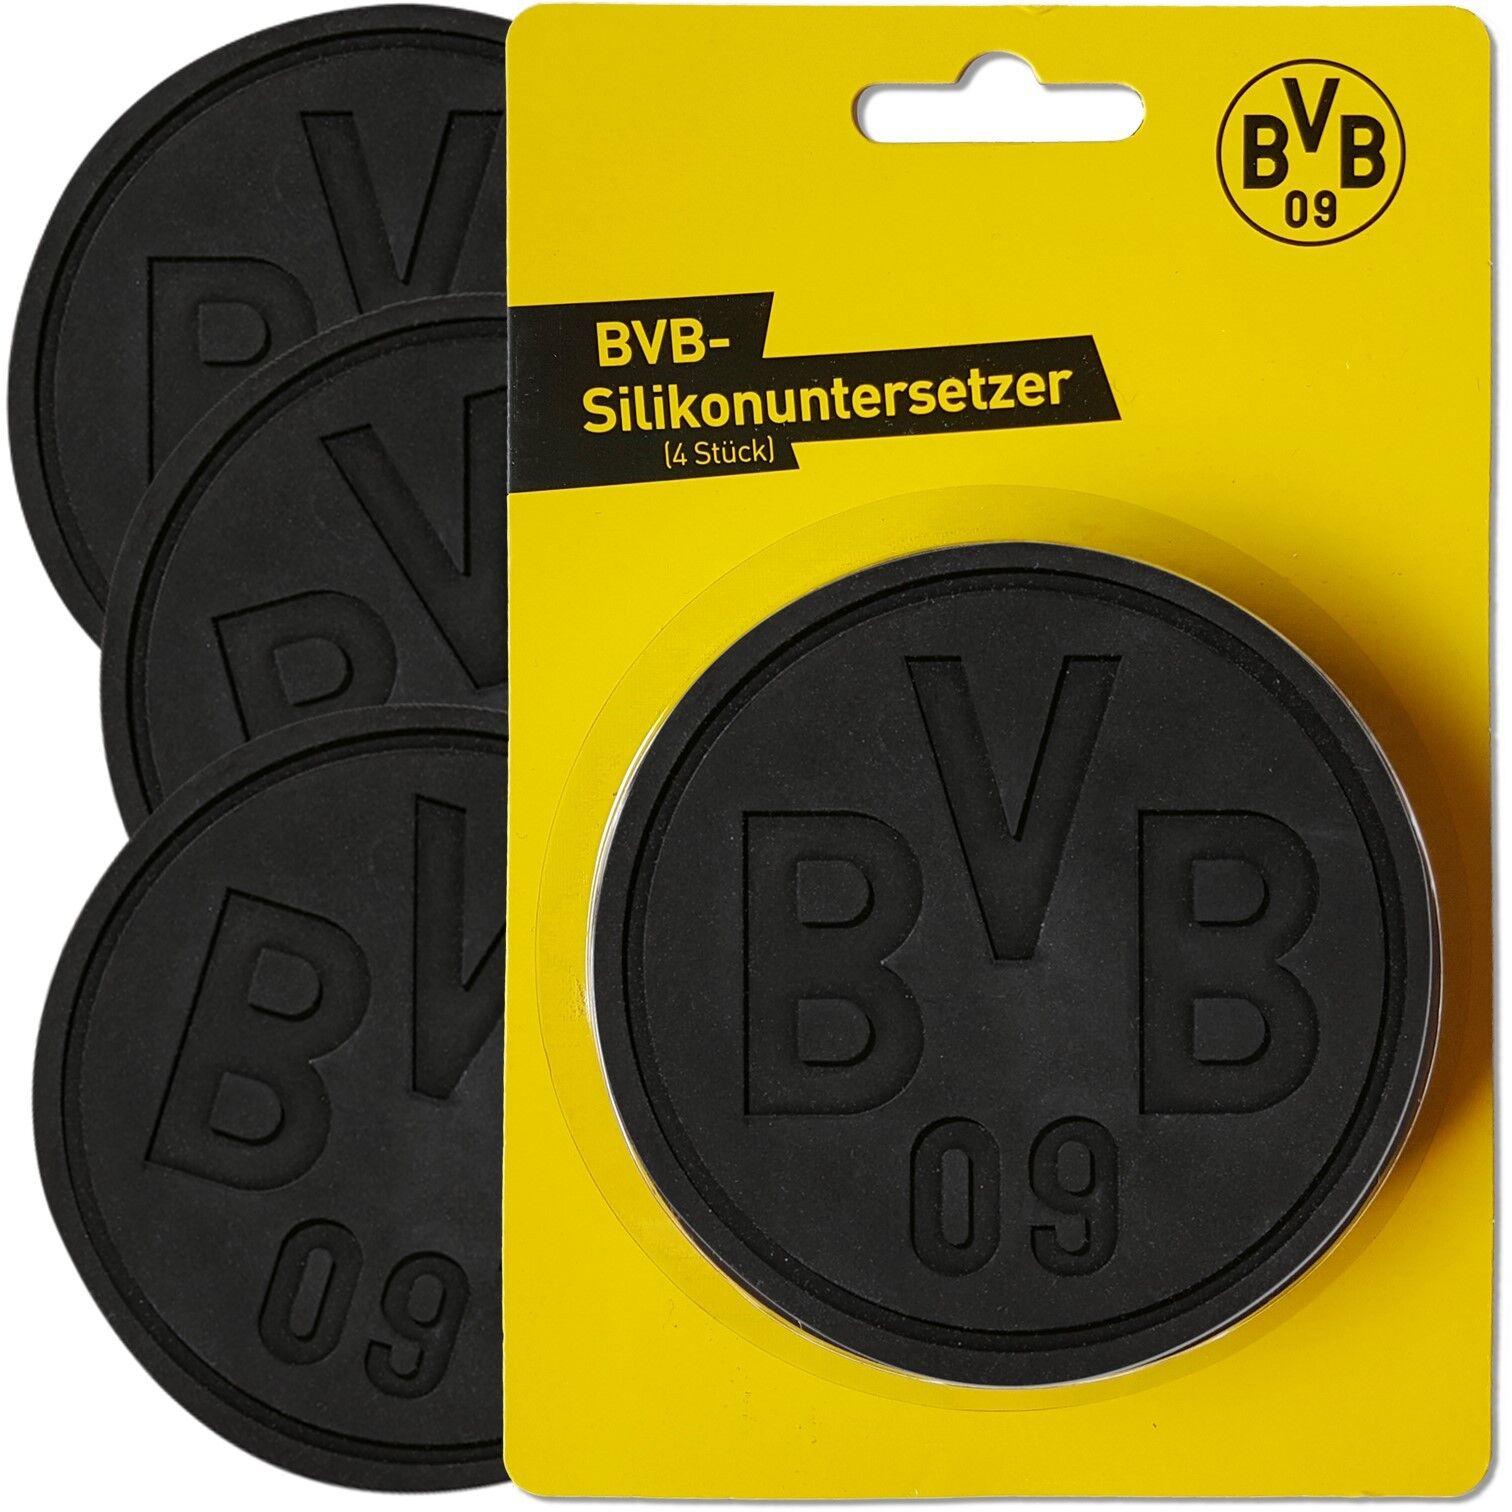 "/""Logo/"" Borussia Dortmund 4Stück BVB Silikonuntersetzer"